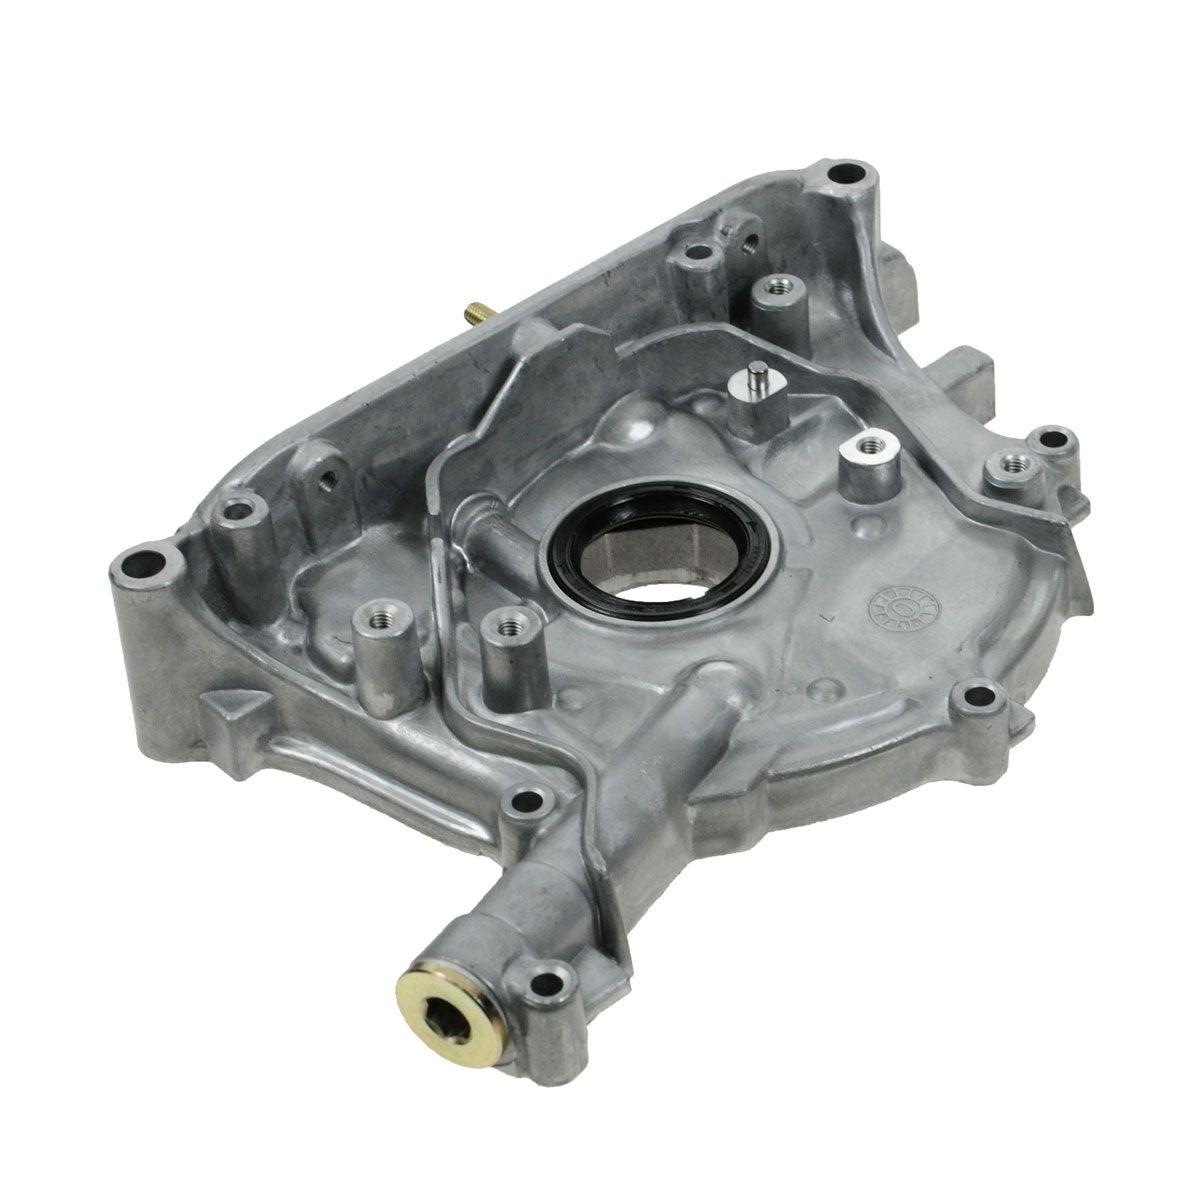 Engine Oil Pump Assembly For Honda Civic Del Sol 1.6L CRV